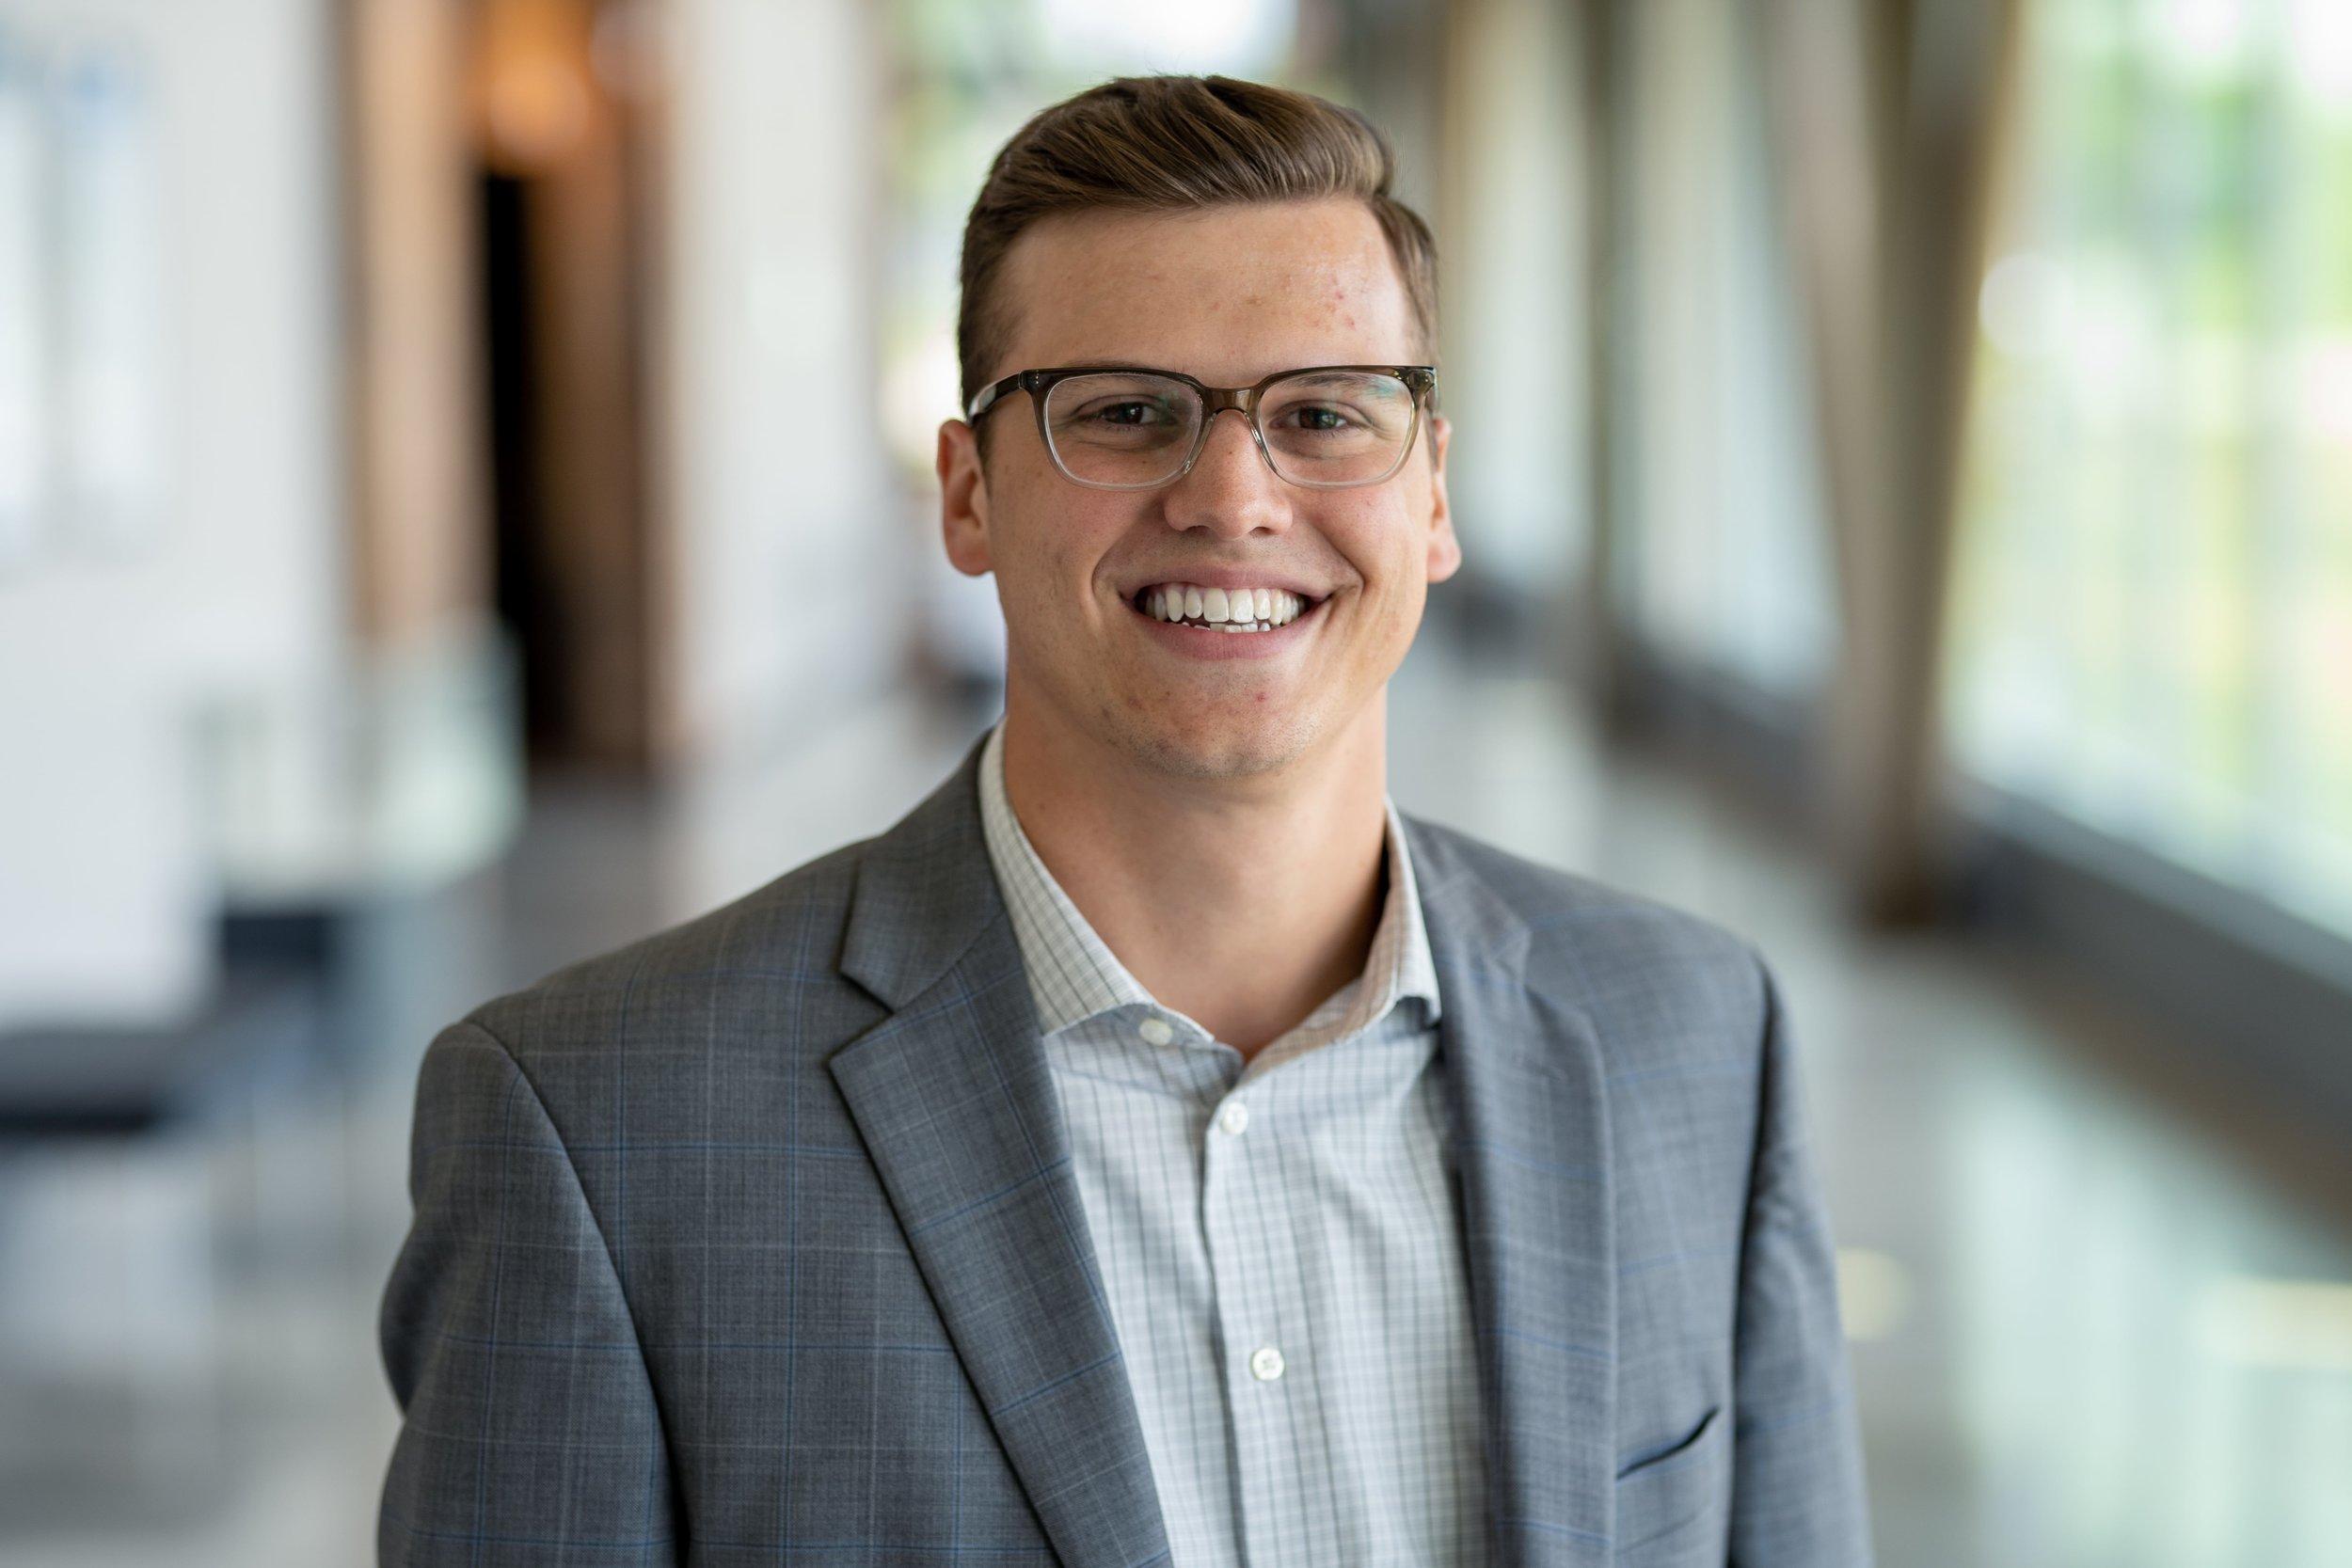 Kyle Fawcett - Director of Marketing